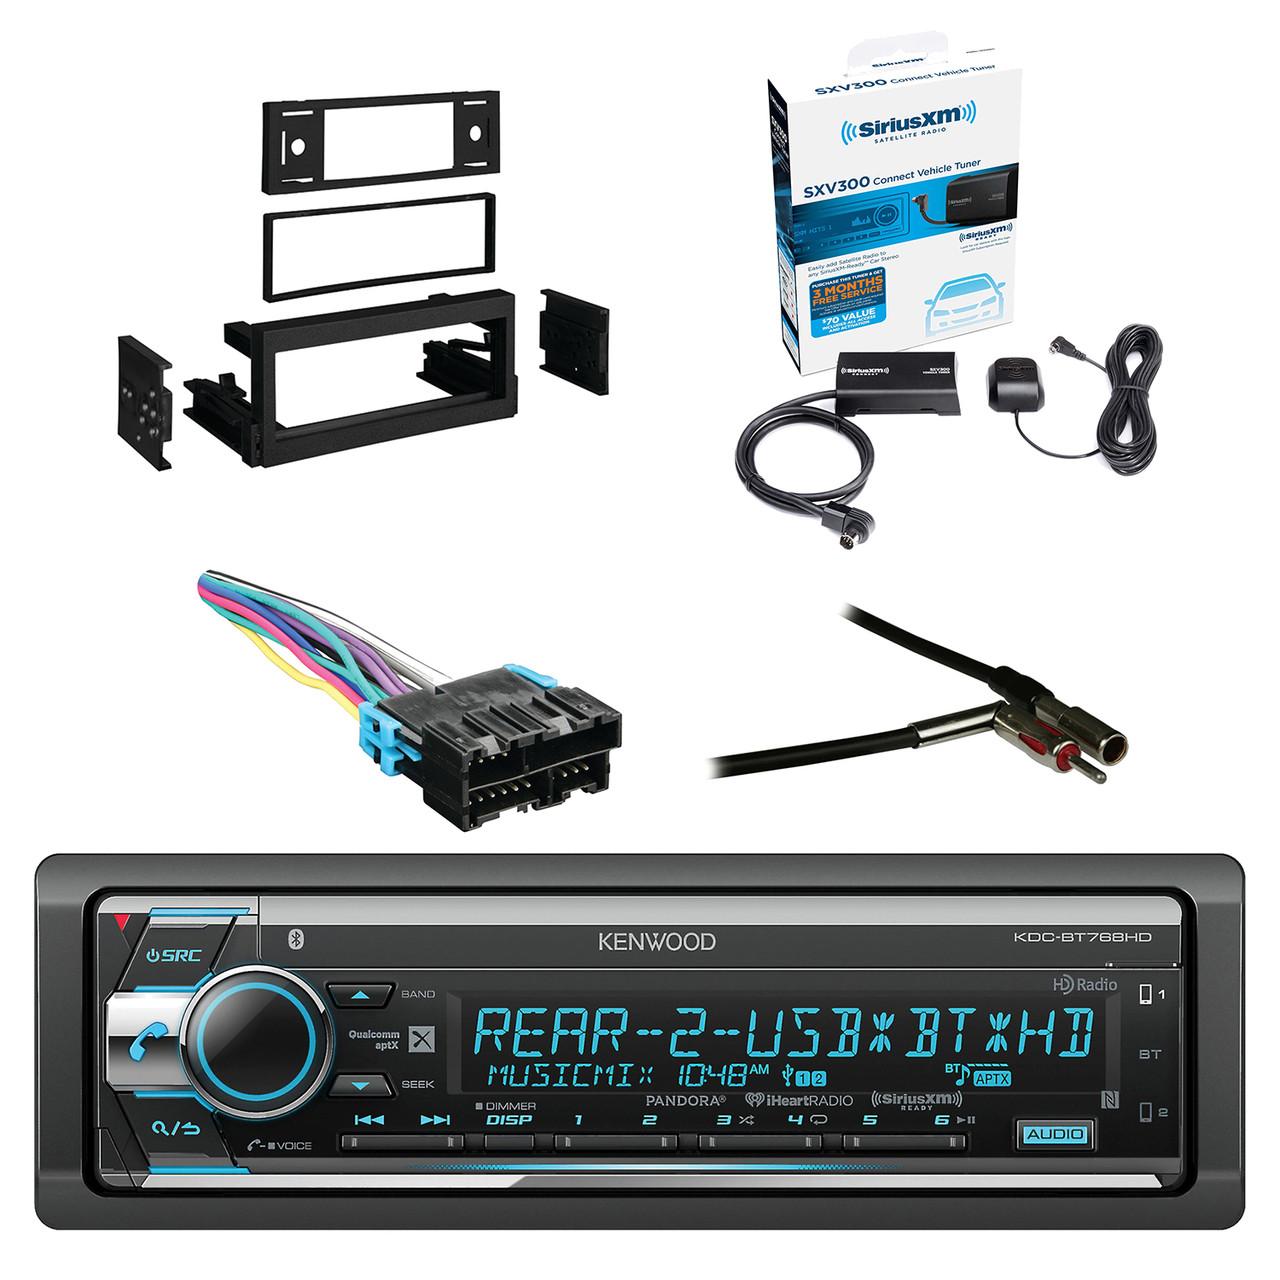 Kenwood Single Din CD/AM/FM Car Audio Receiver W/Bluetooth with SiriusXM  Satellite Radio Vehicle Tuner Kit, Metra Dash Kit For GM Truck And Van  95-05, ...